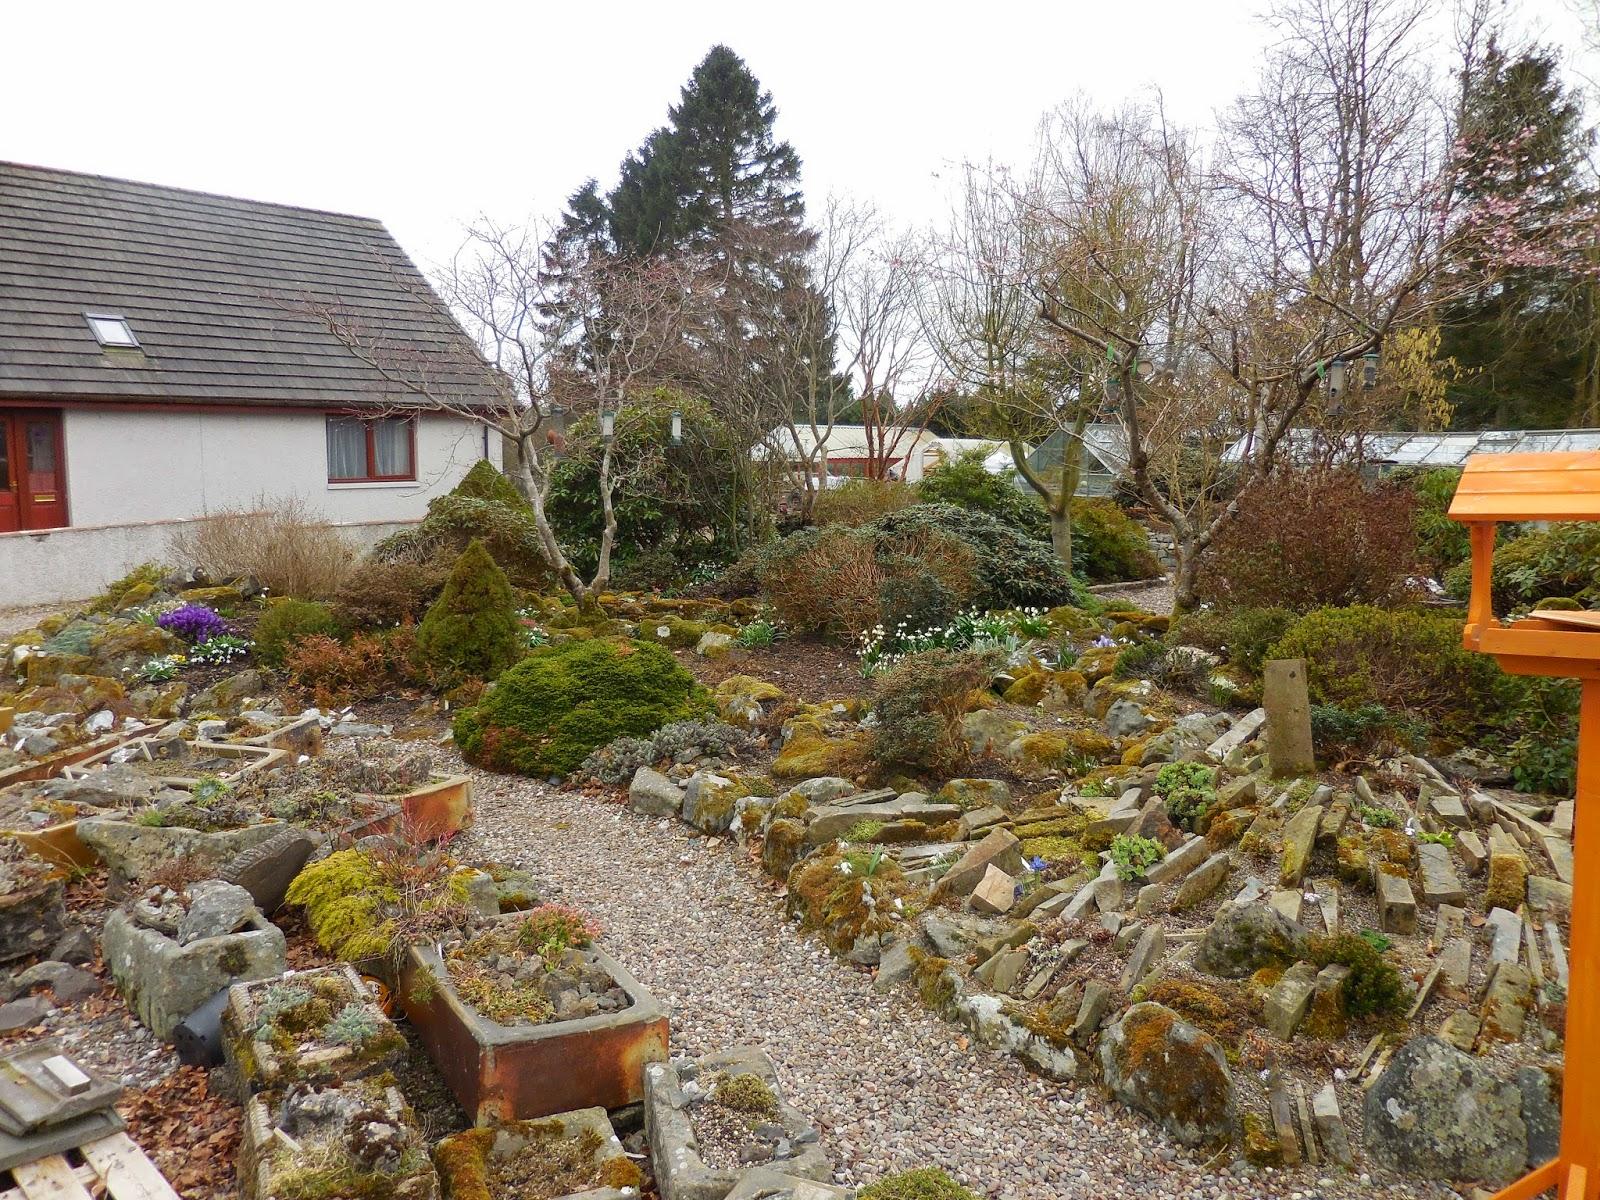 Alpine Houses of England and Scotland